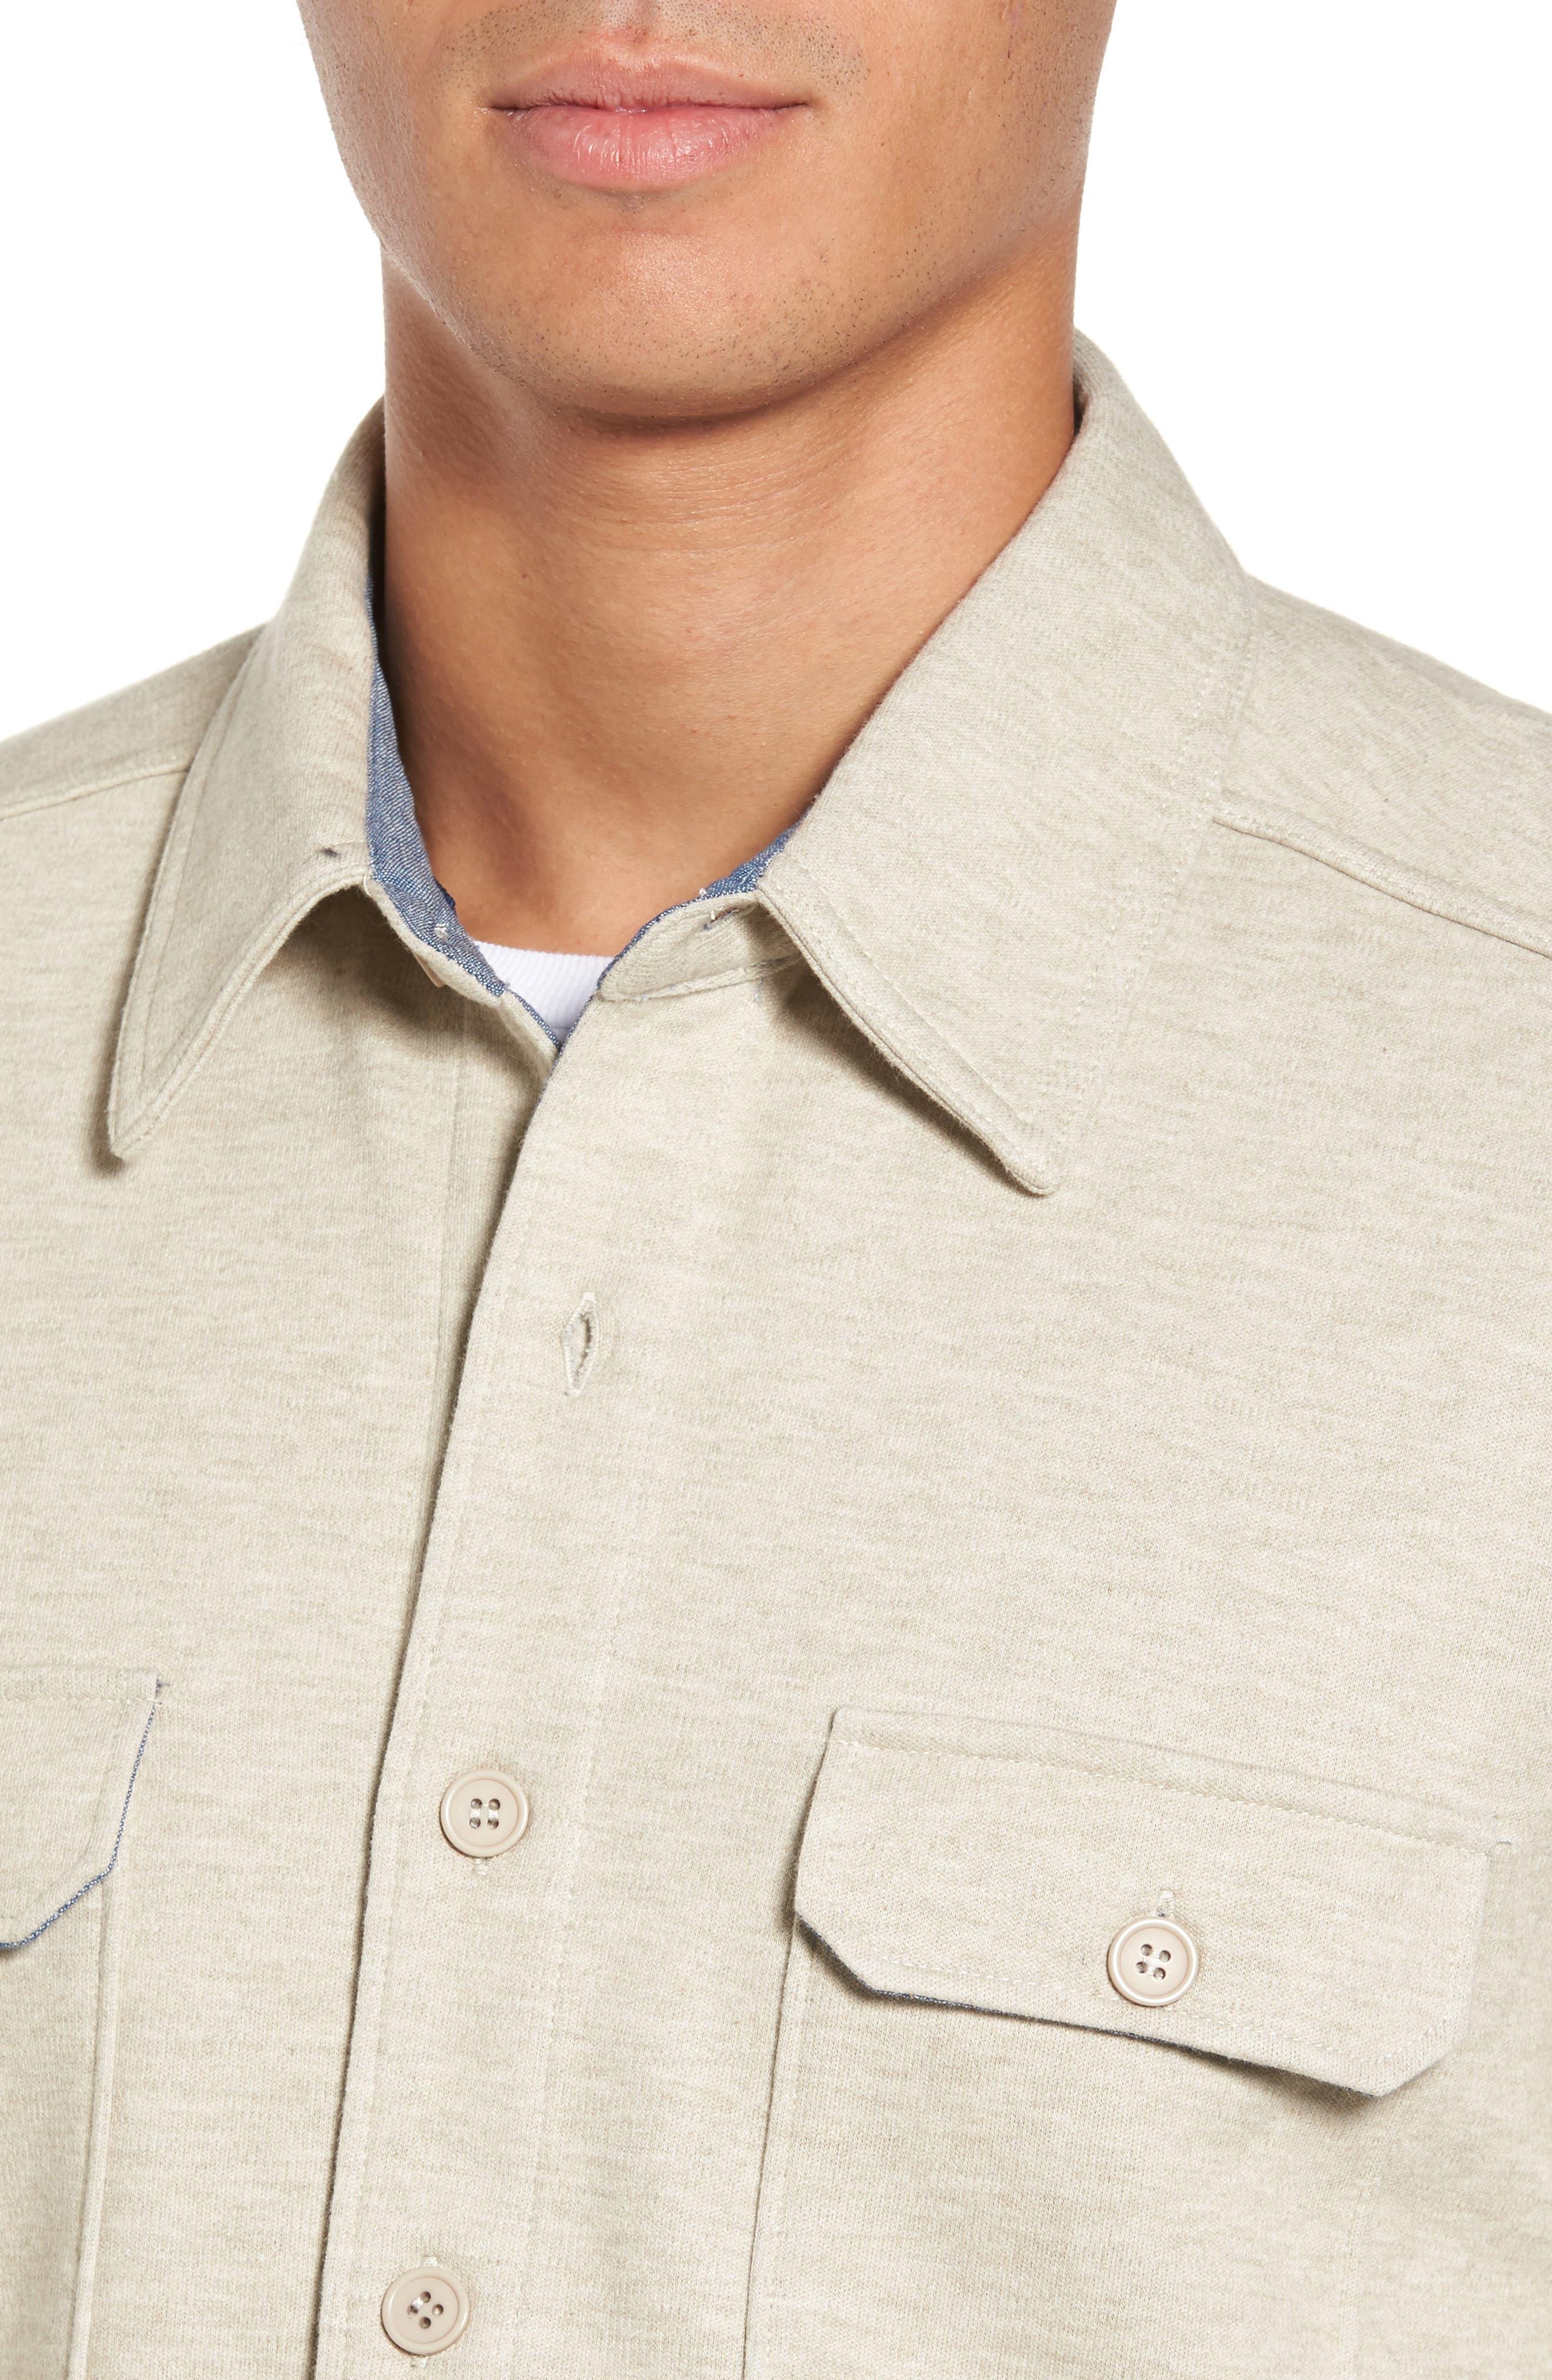 'Longitude' Flap Pocket Fleece Shirt,                             Alternate thumbnail 4, color,                             Bamboo Ivory